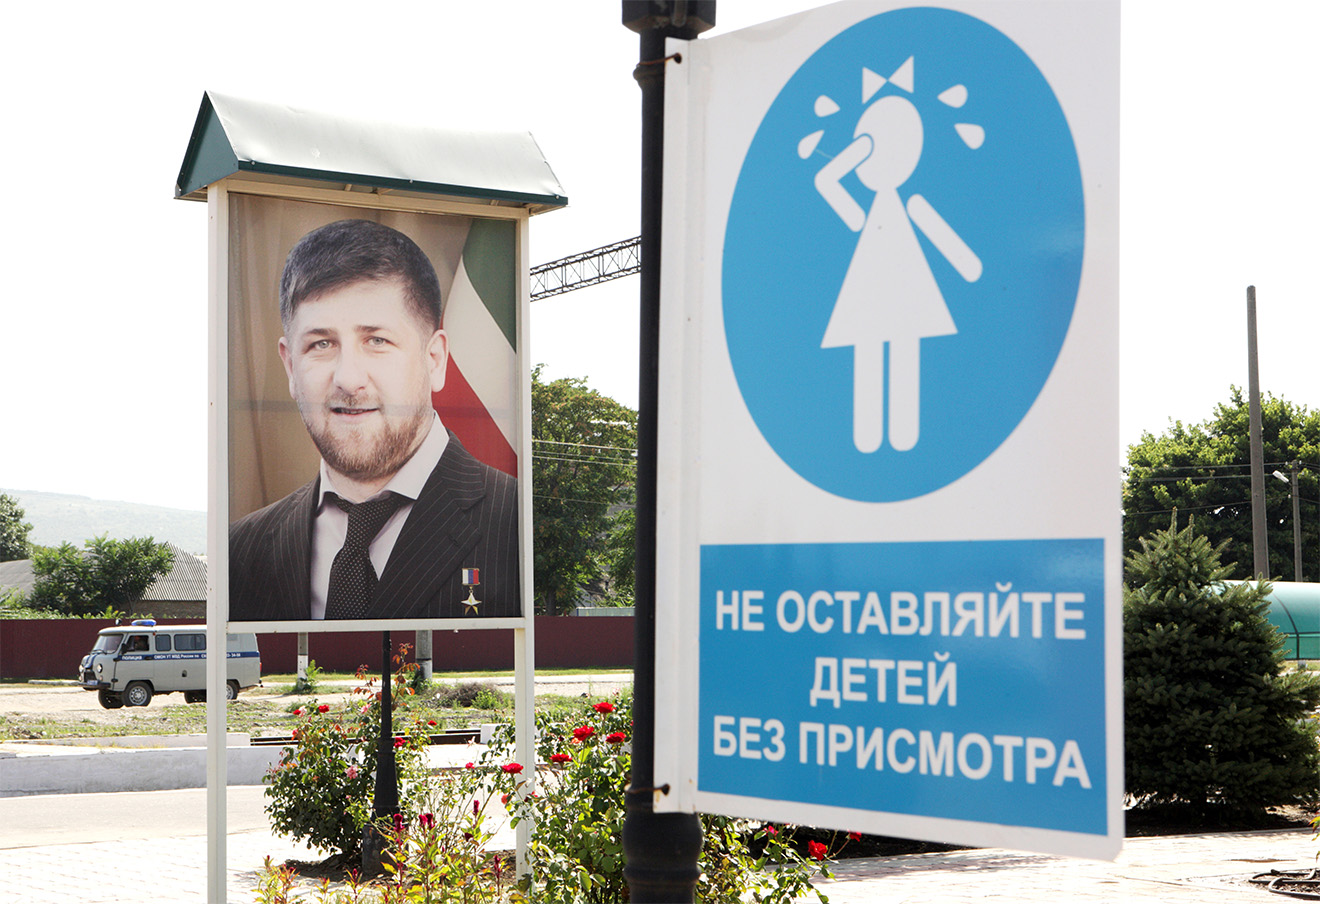 Фото: Василий Шитов / ТАСС